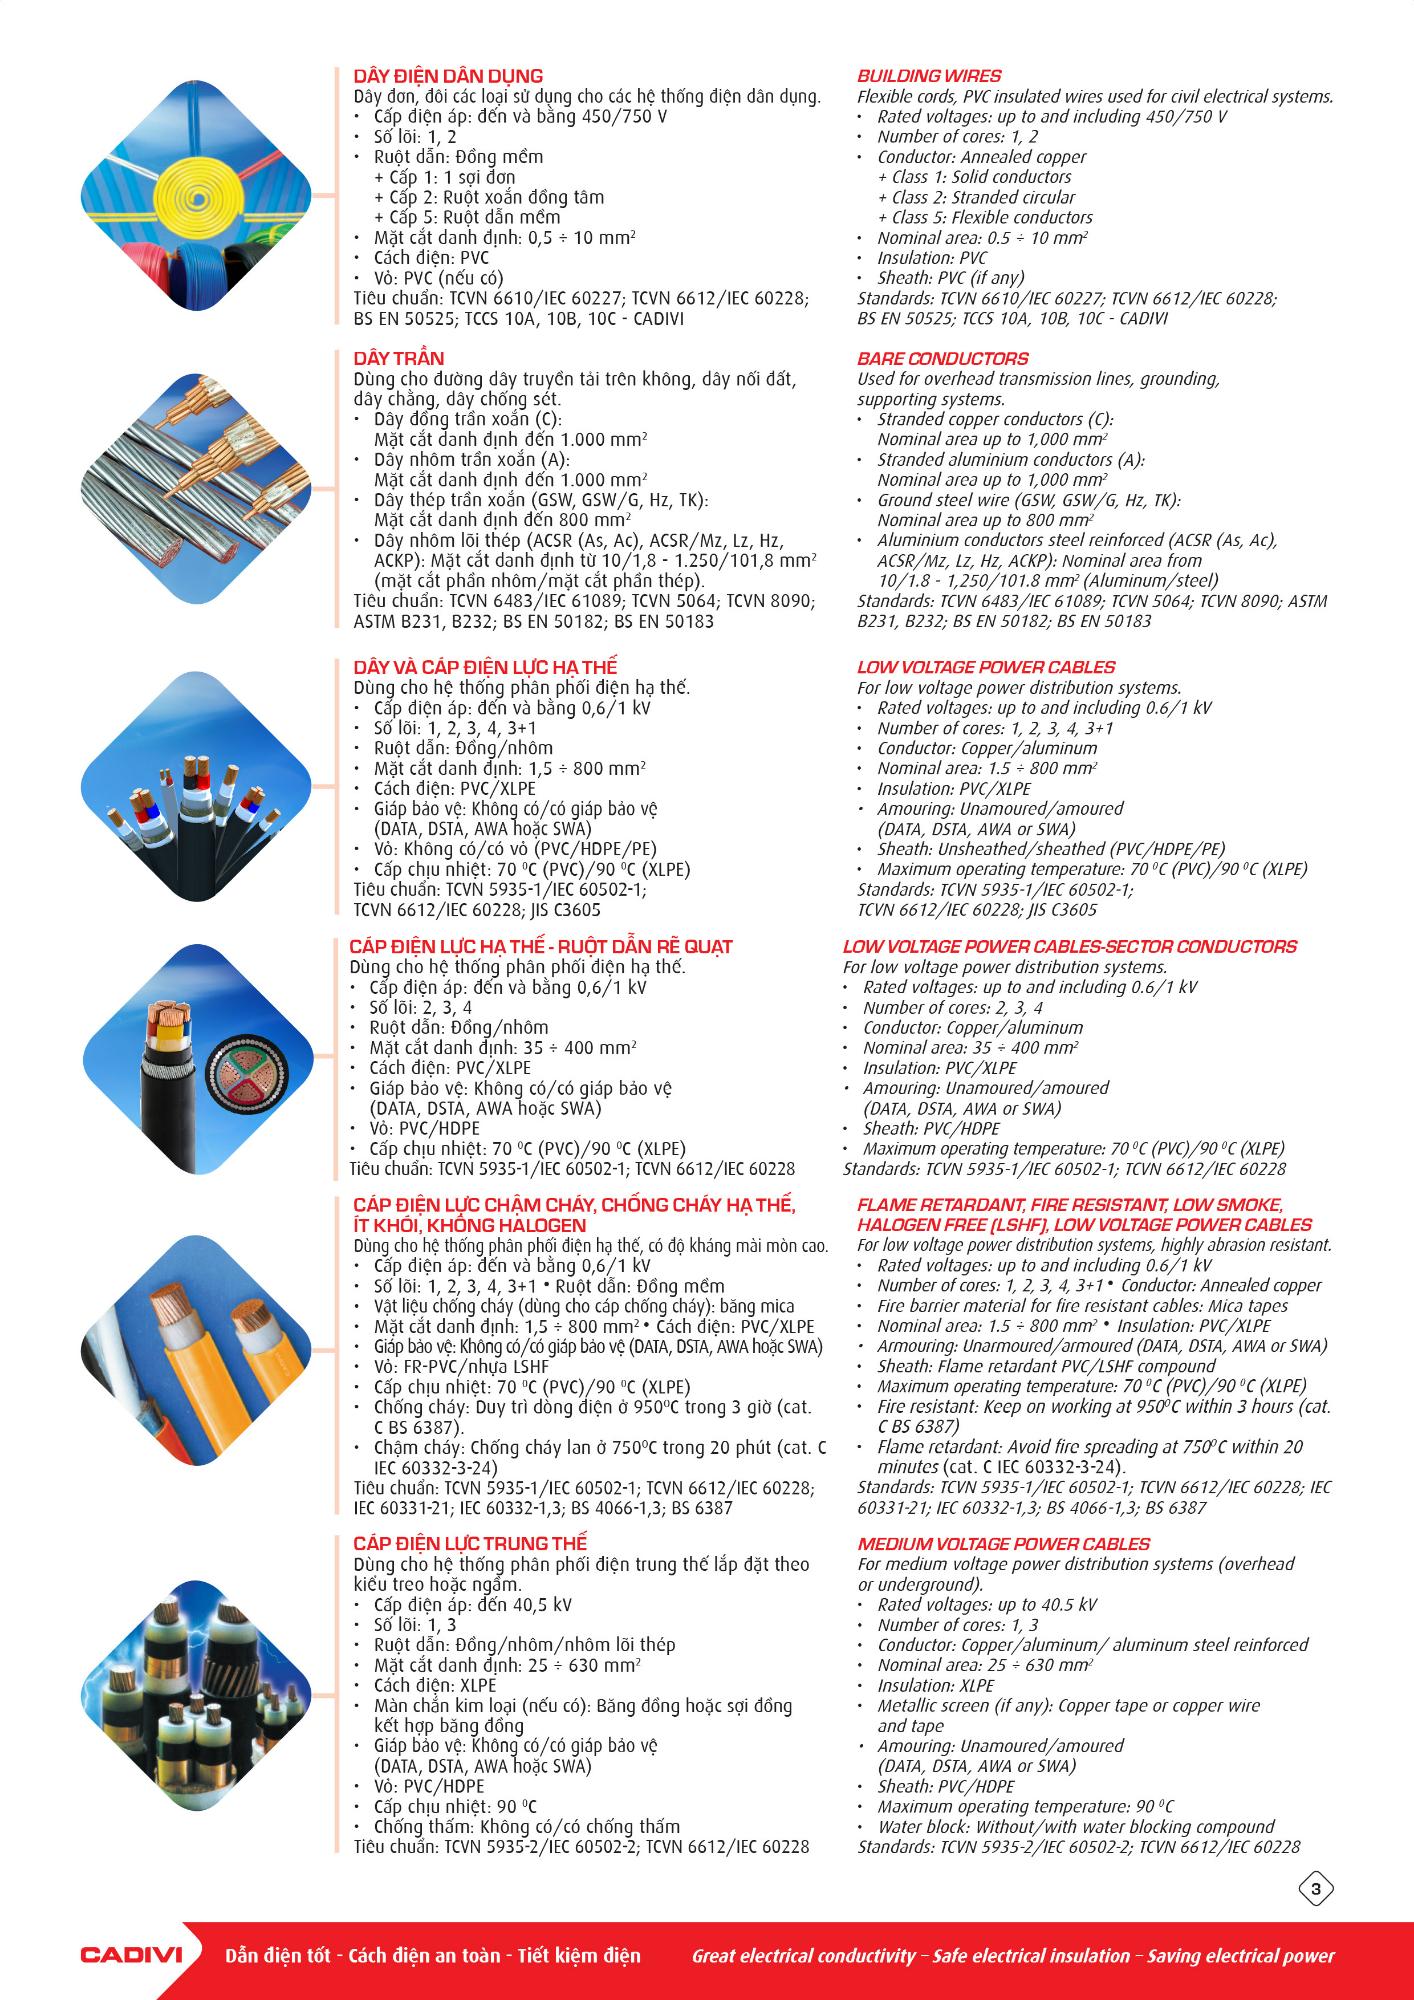 Catalogue các loại dây cáp điện Cadivi